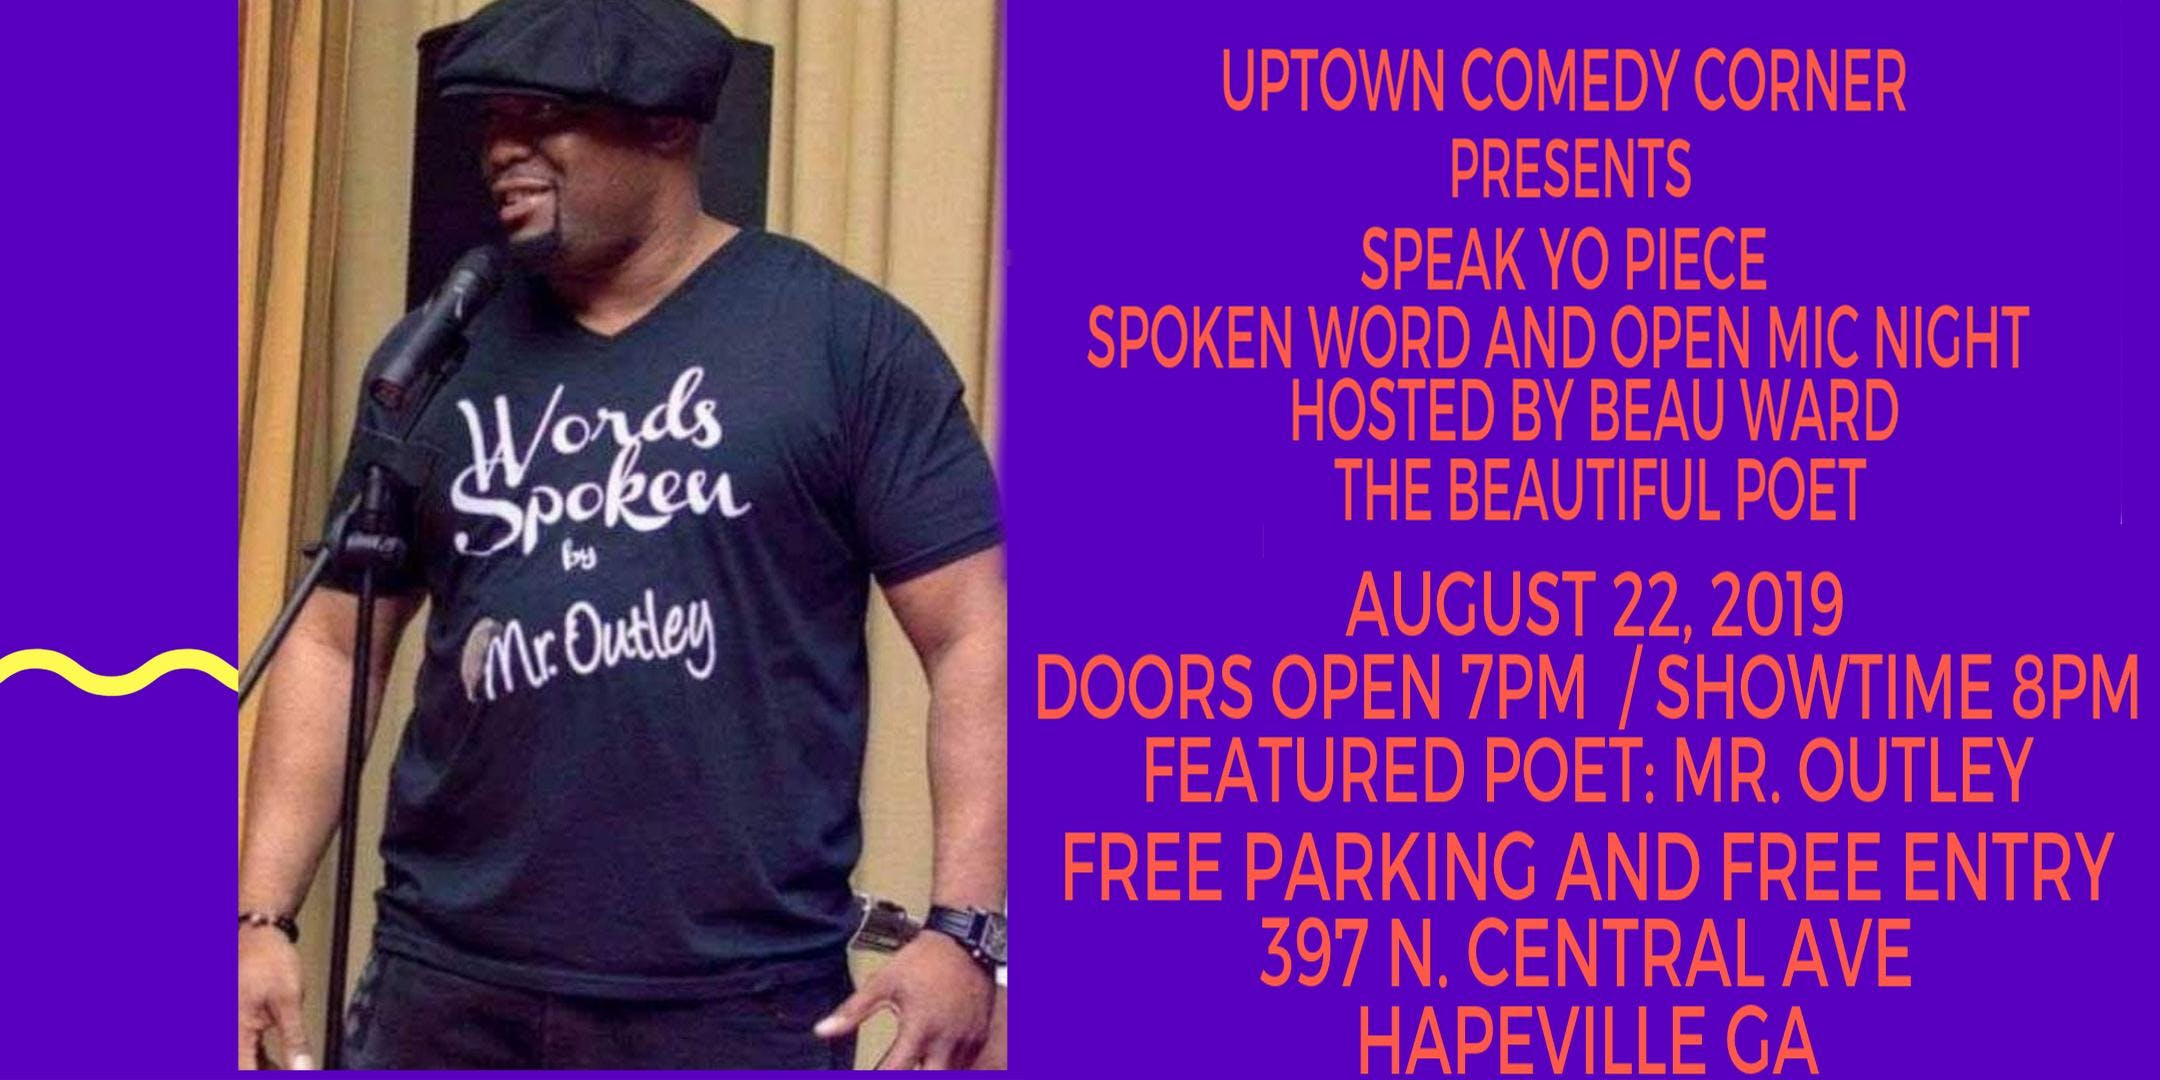 Atlanta's Original Uptown Comedy Corner